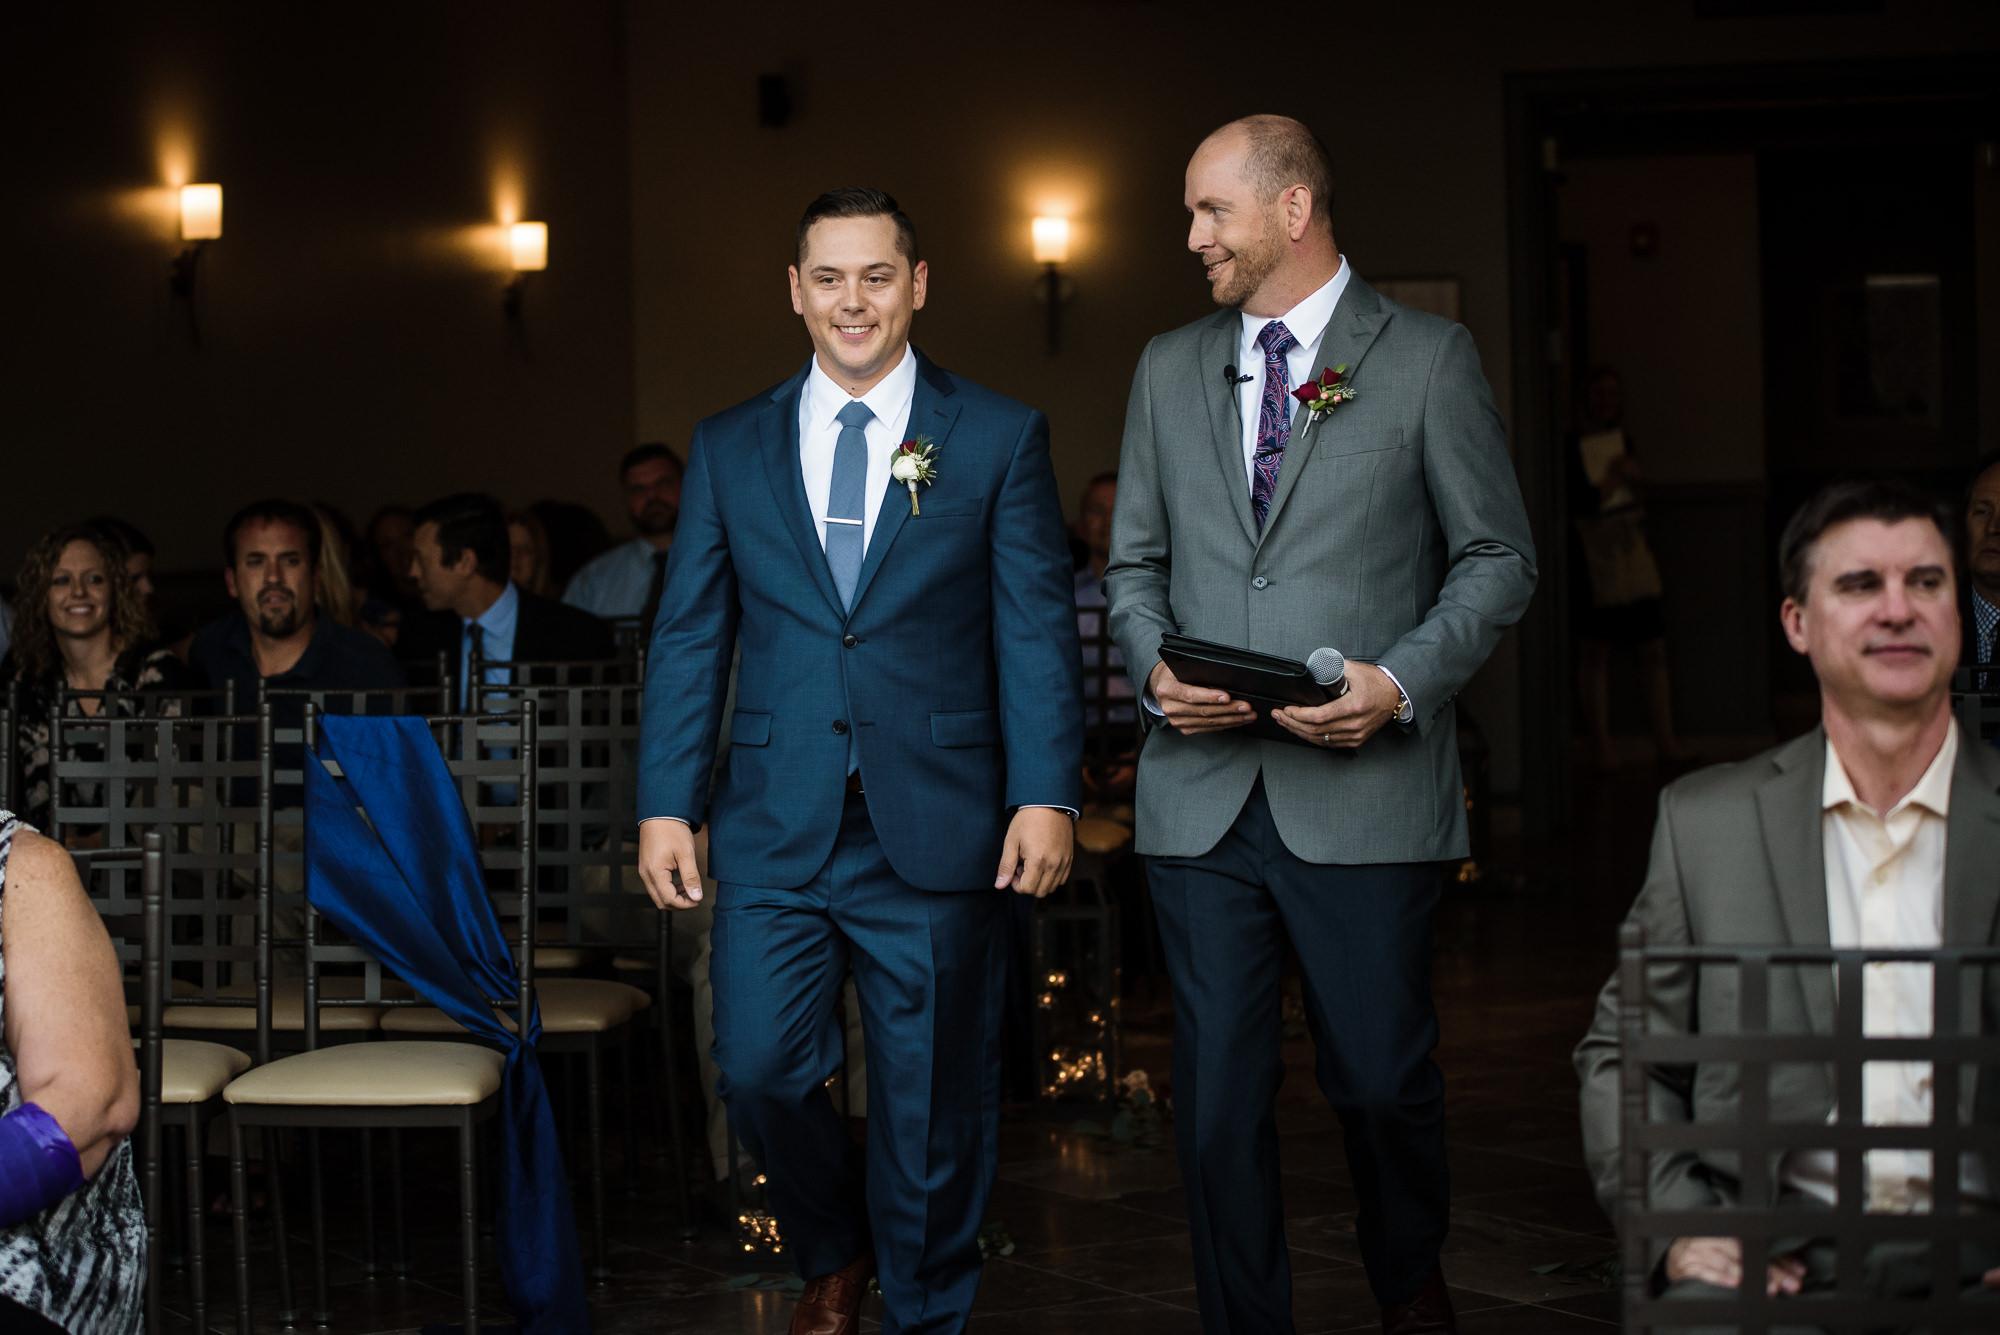 KEVIN-STACY-NOAHS-EVENT-VENUE-OMAHA-WEDDING-PHOTOGRAPHER-017.jpg